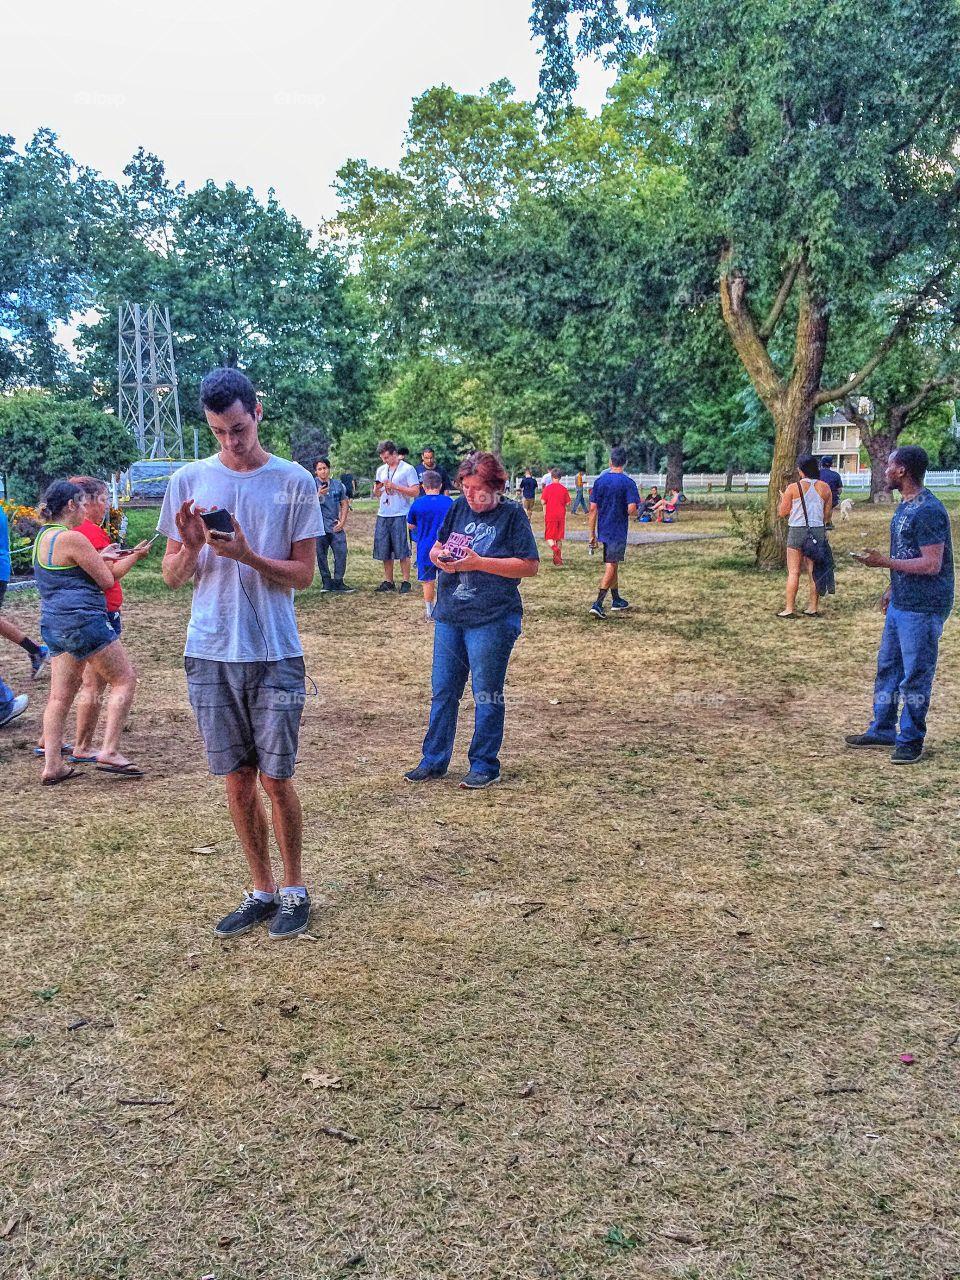 People enjoying in park